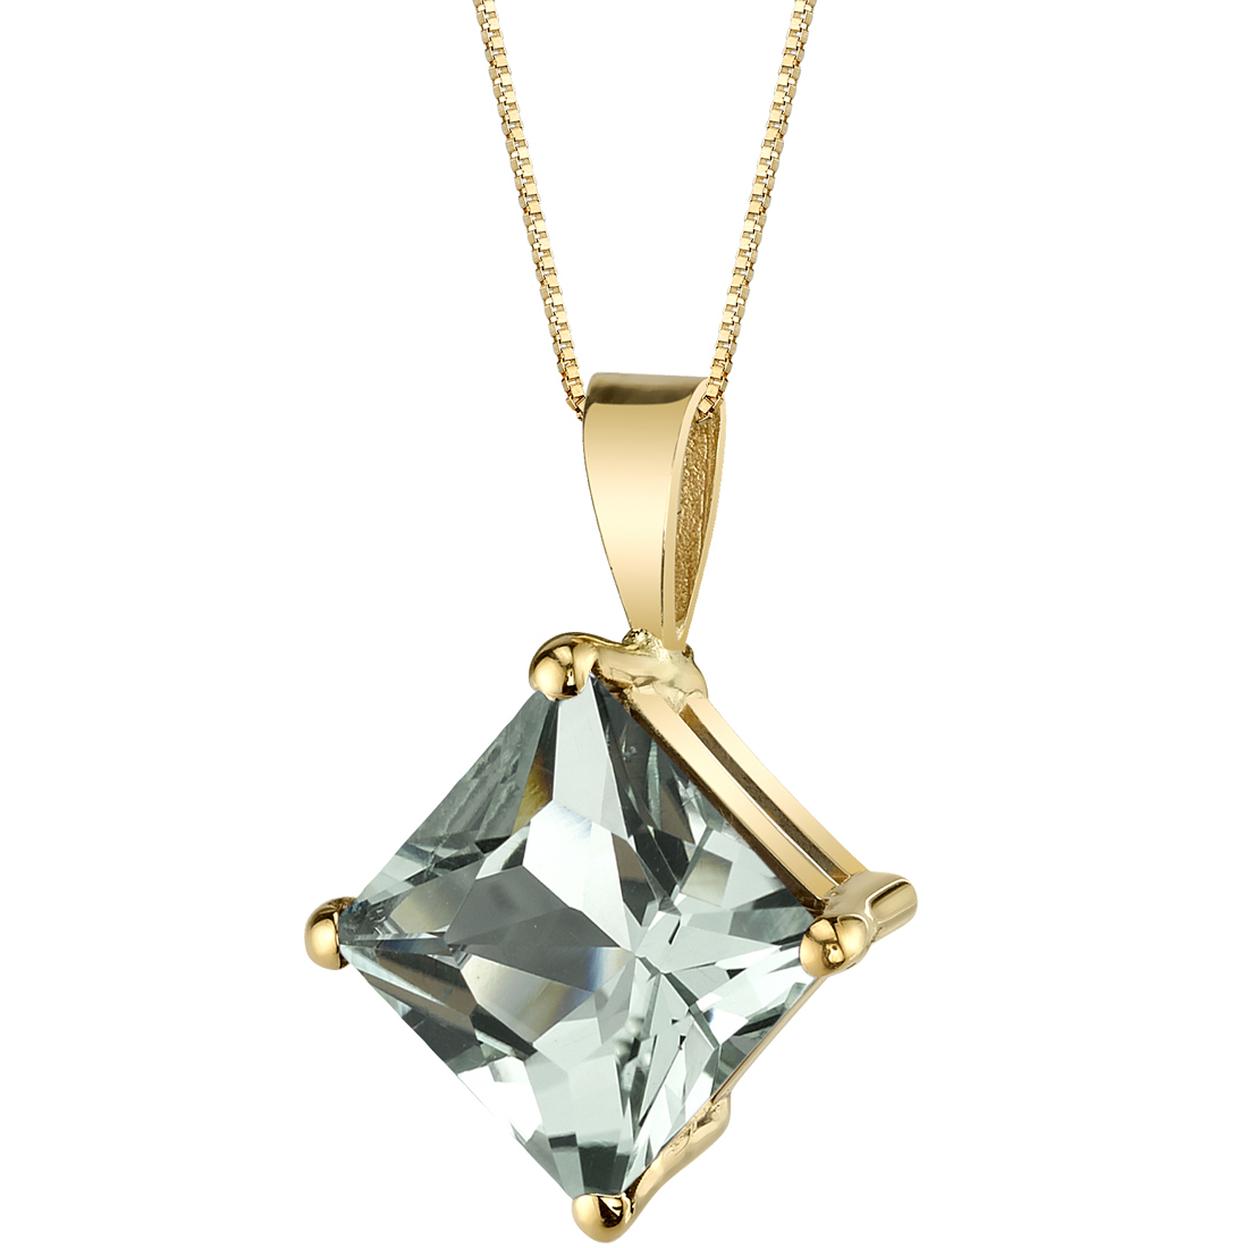 Oravo 14 Karat Yellow Gold Princess Cut 2.25 Carats Green Amethyst Pendant